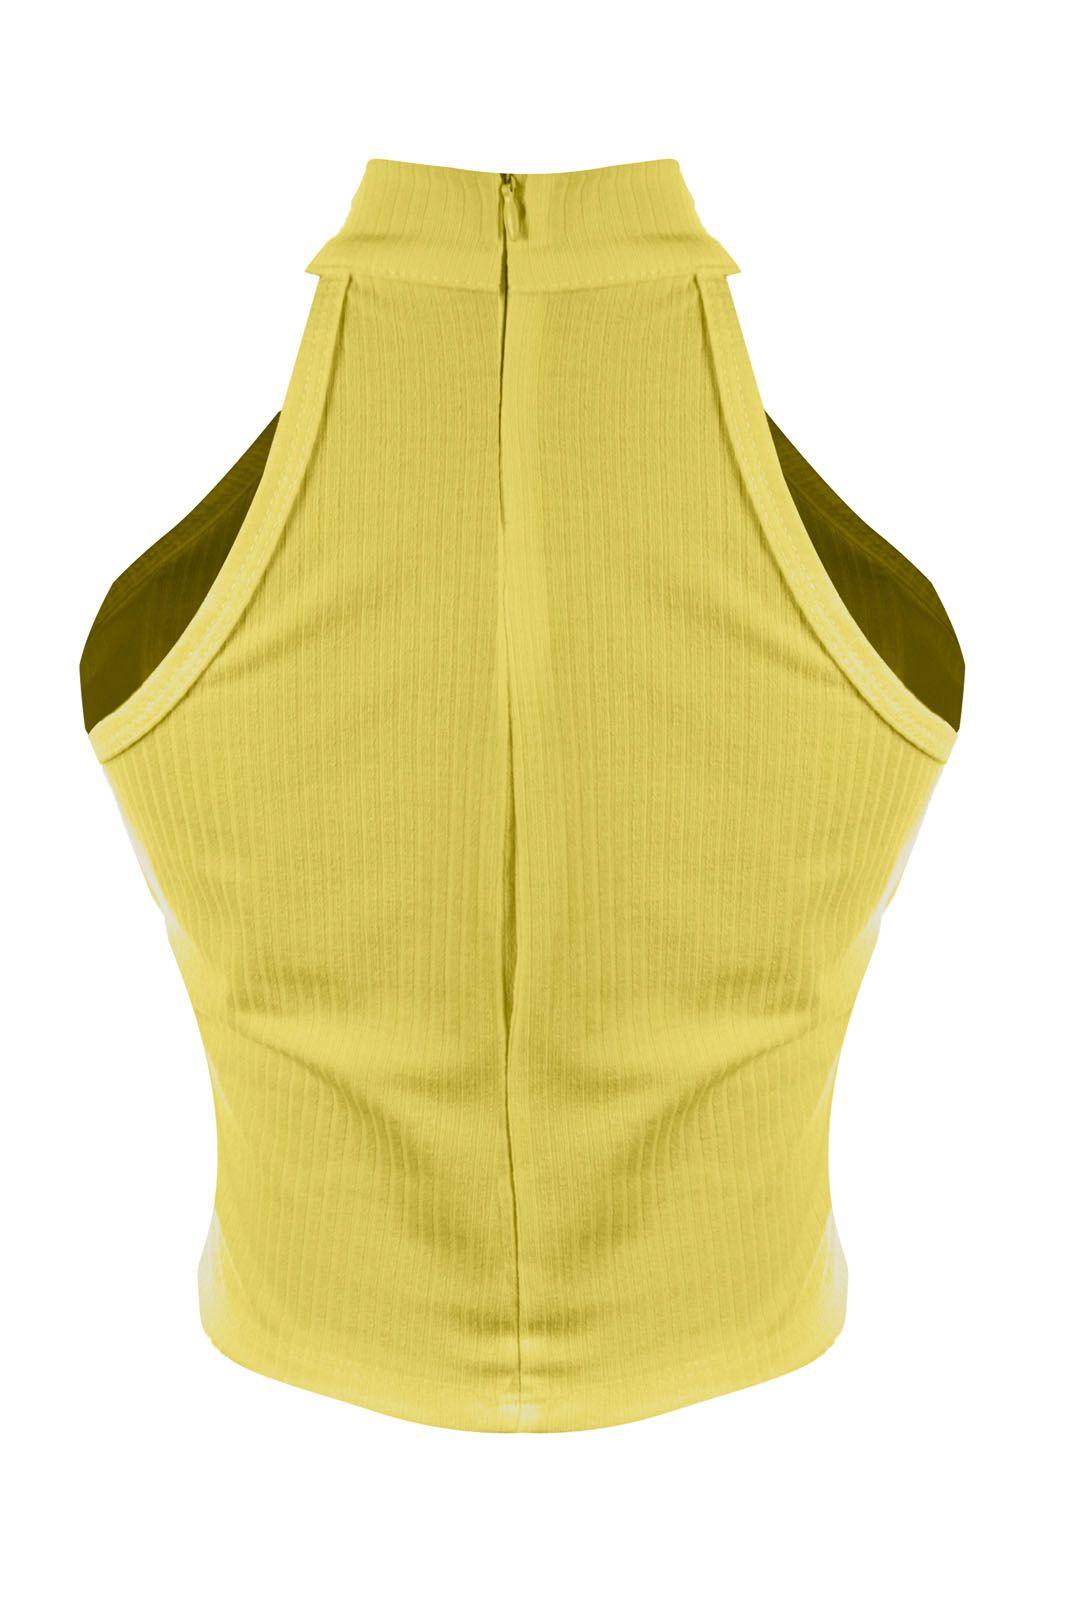 Top OutletDri Cropped Canelado Liso Frente Única Zíper Costas Amarelo